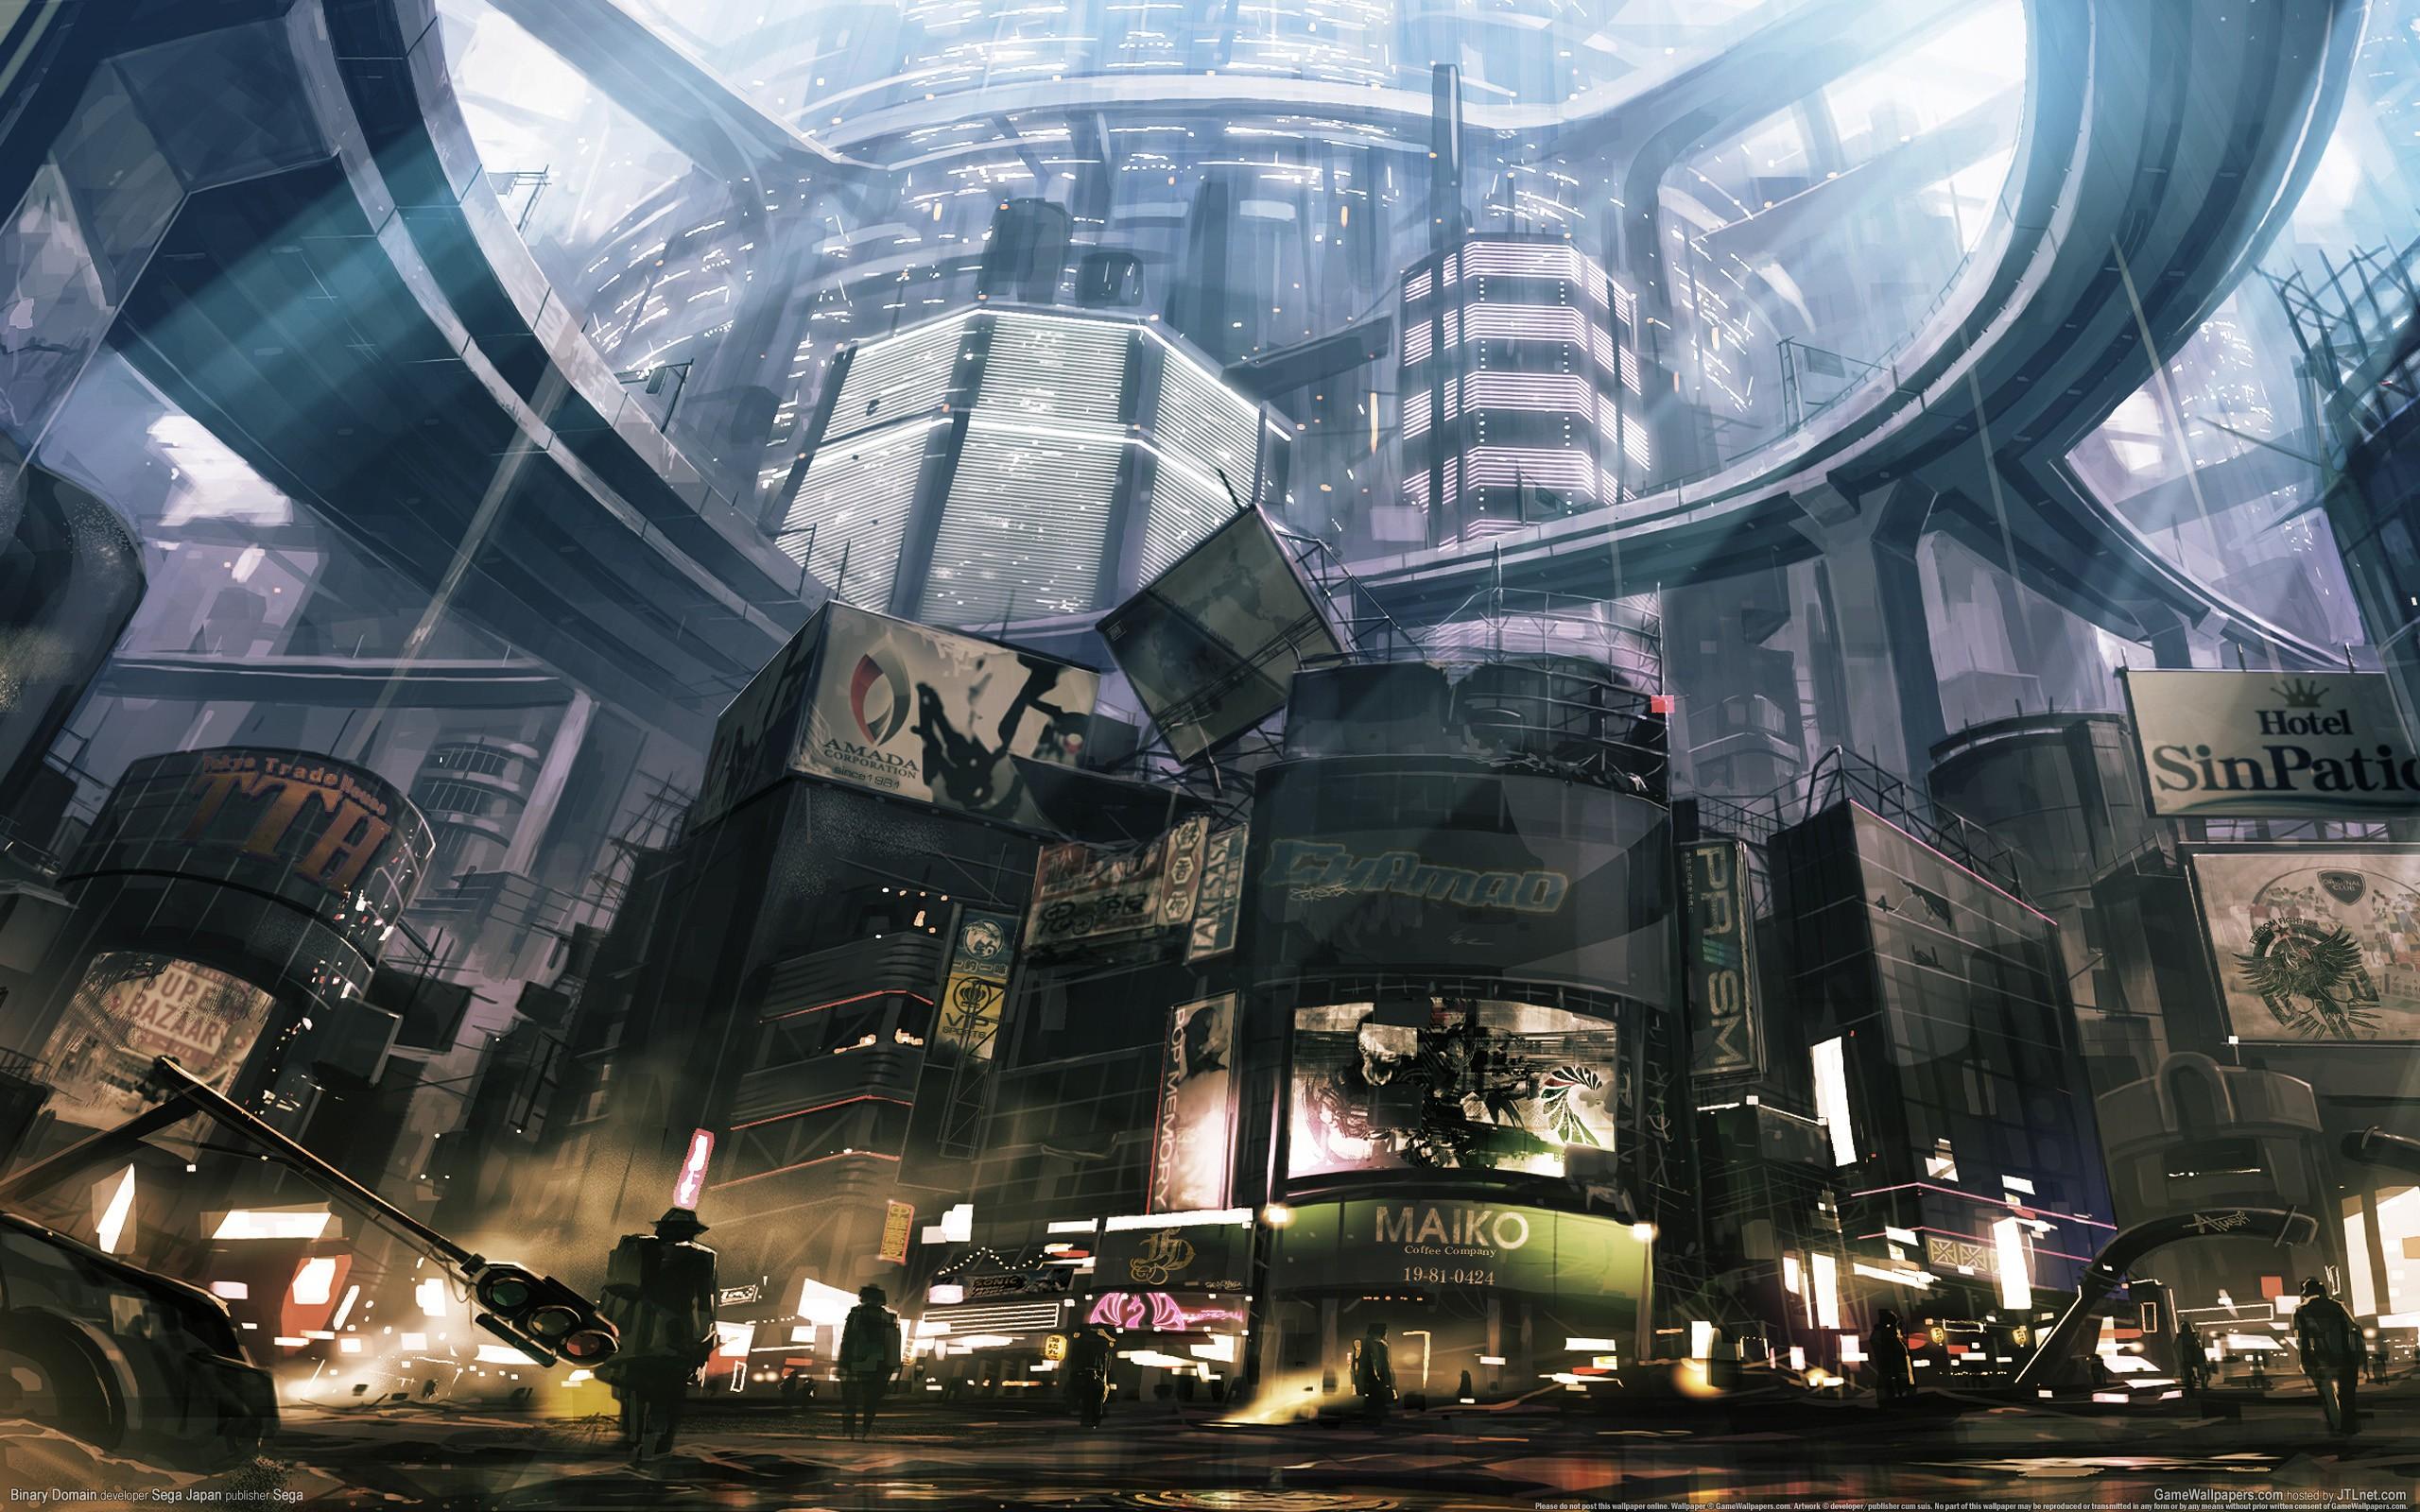 General 2560x1600 cyberpunk futuristic artwork cityscape futuristic city science fiction